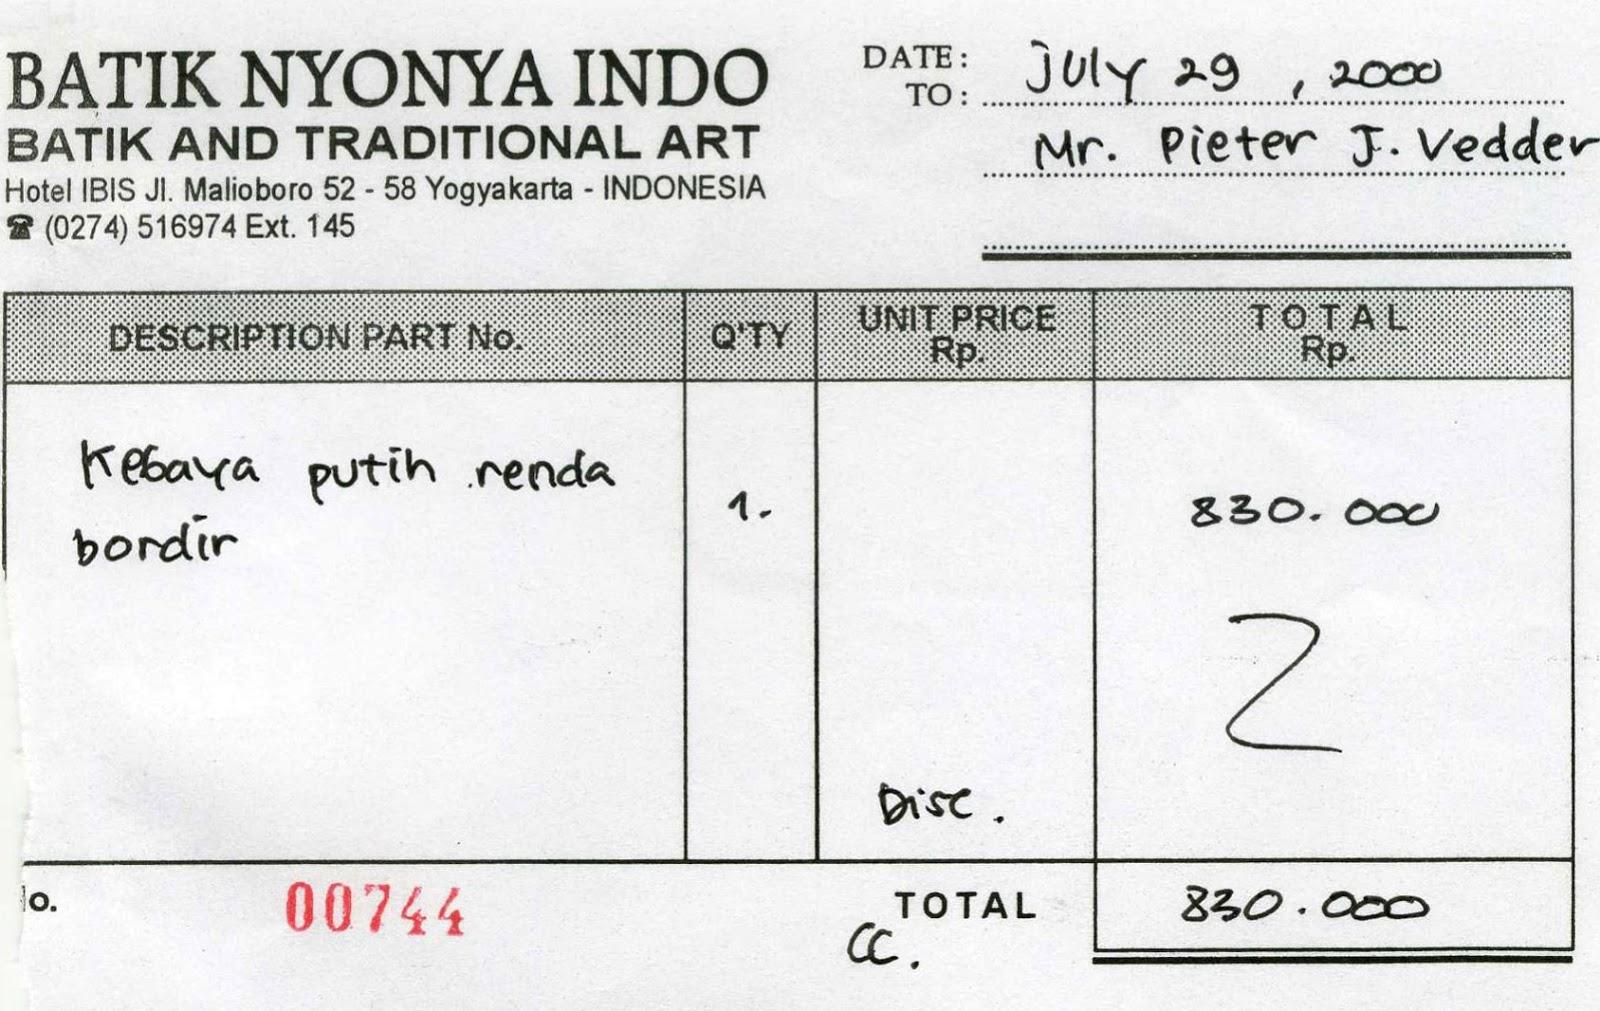 Mariettes Back To Basics My Indonesian Silk Batik Sarong Kebaya Dress Putih Renda A30554 Purchased At Hotel Ibis Jl Malioboro In Yogyakarta Indonesia